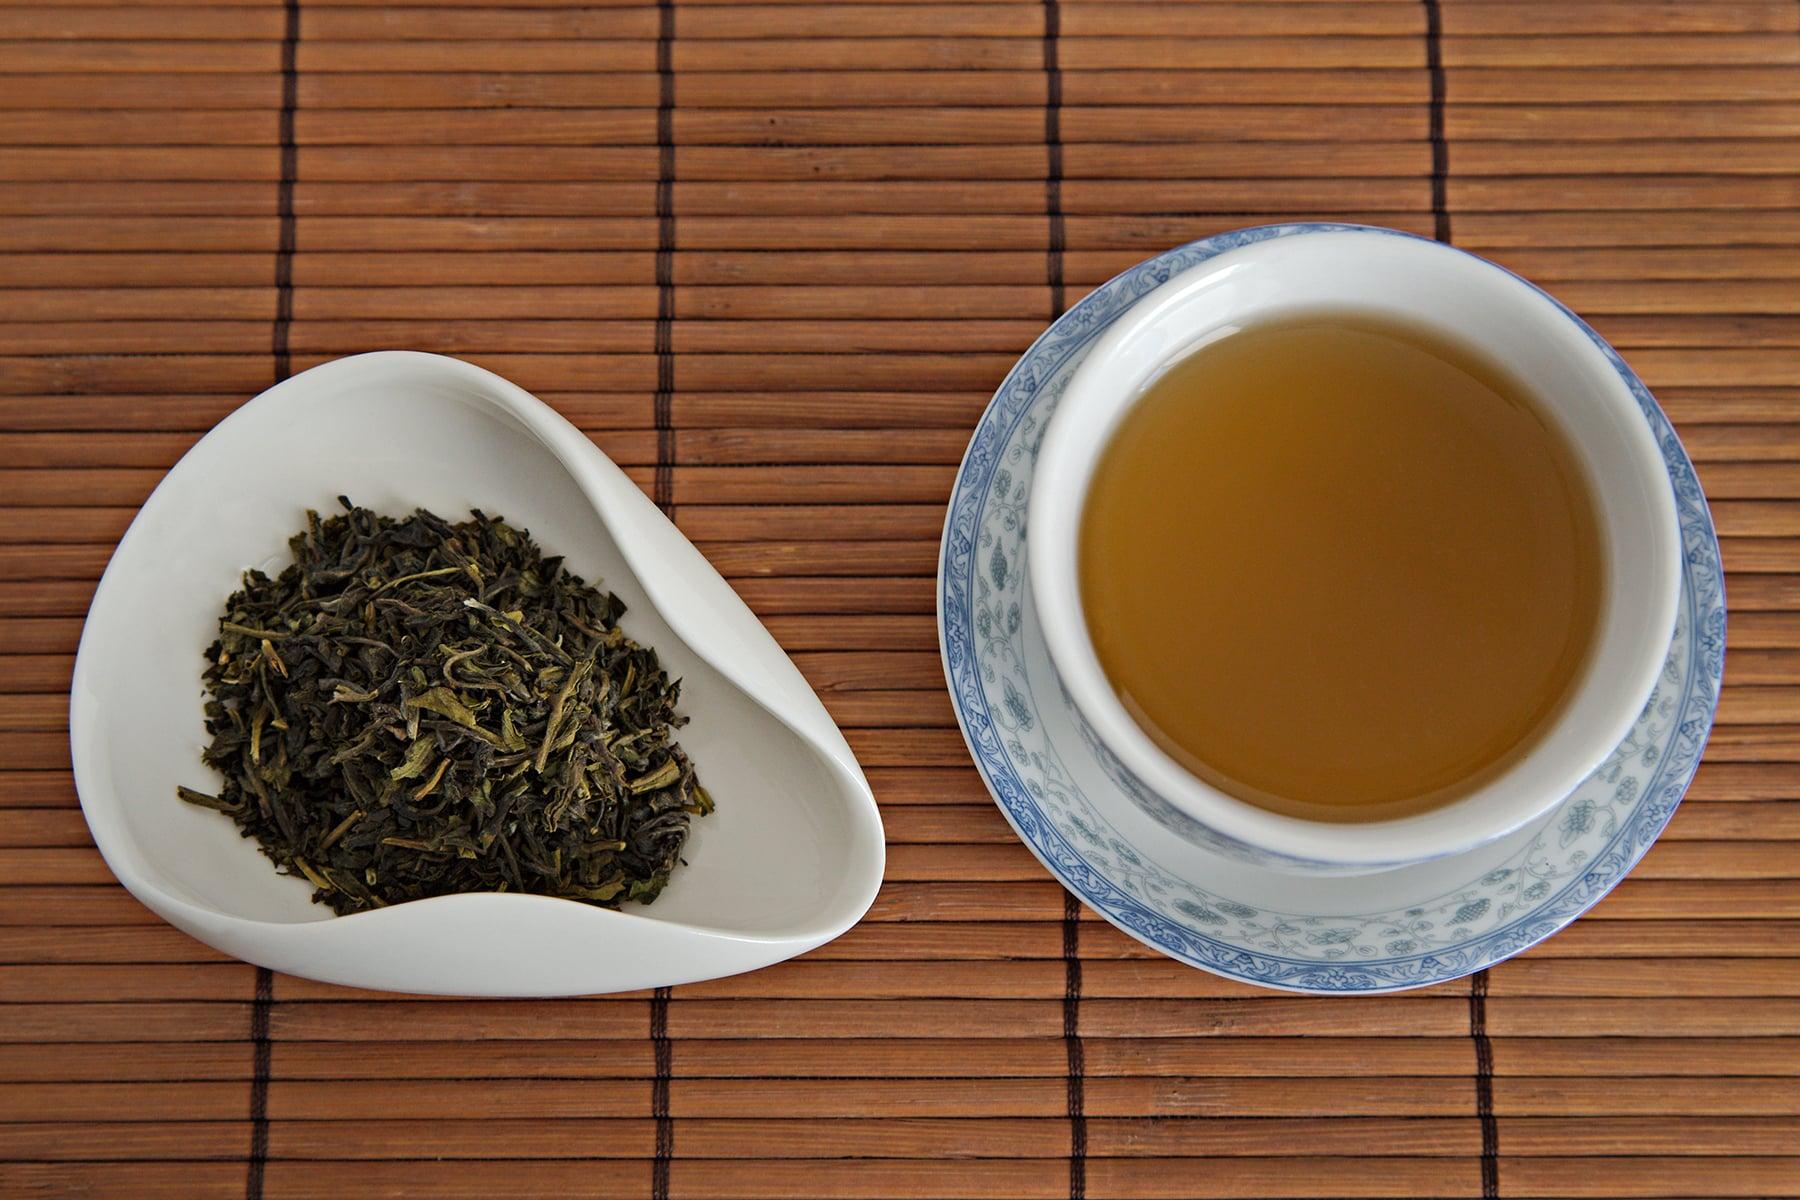 Tea Review: Organic Premium Green Tea - Golden Tips